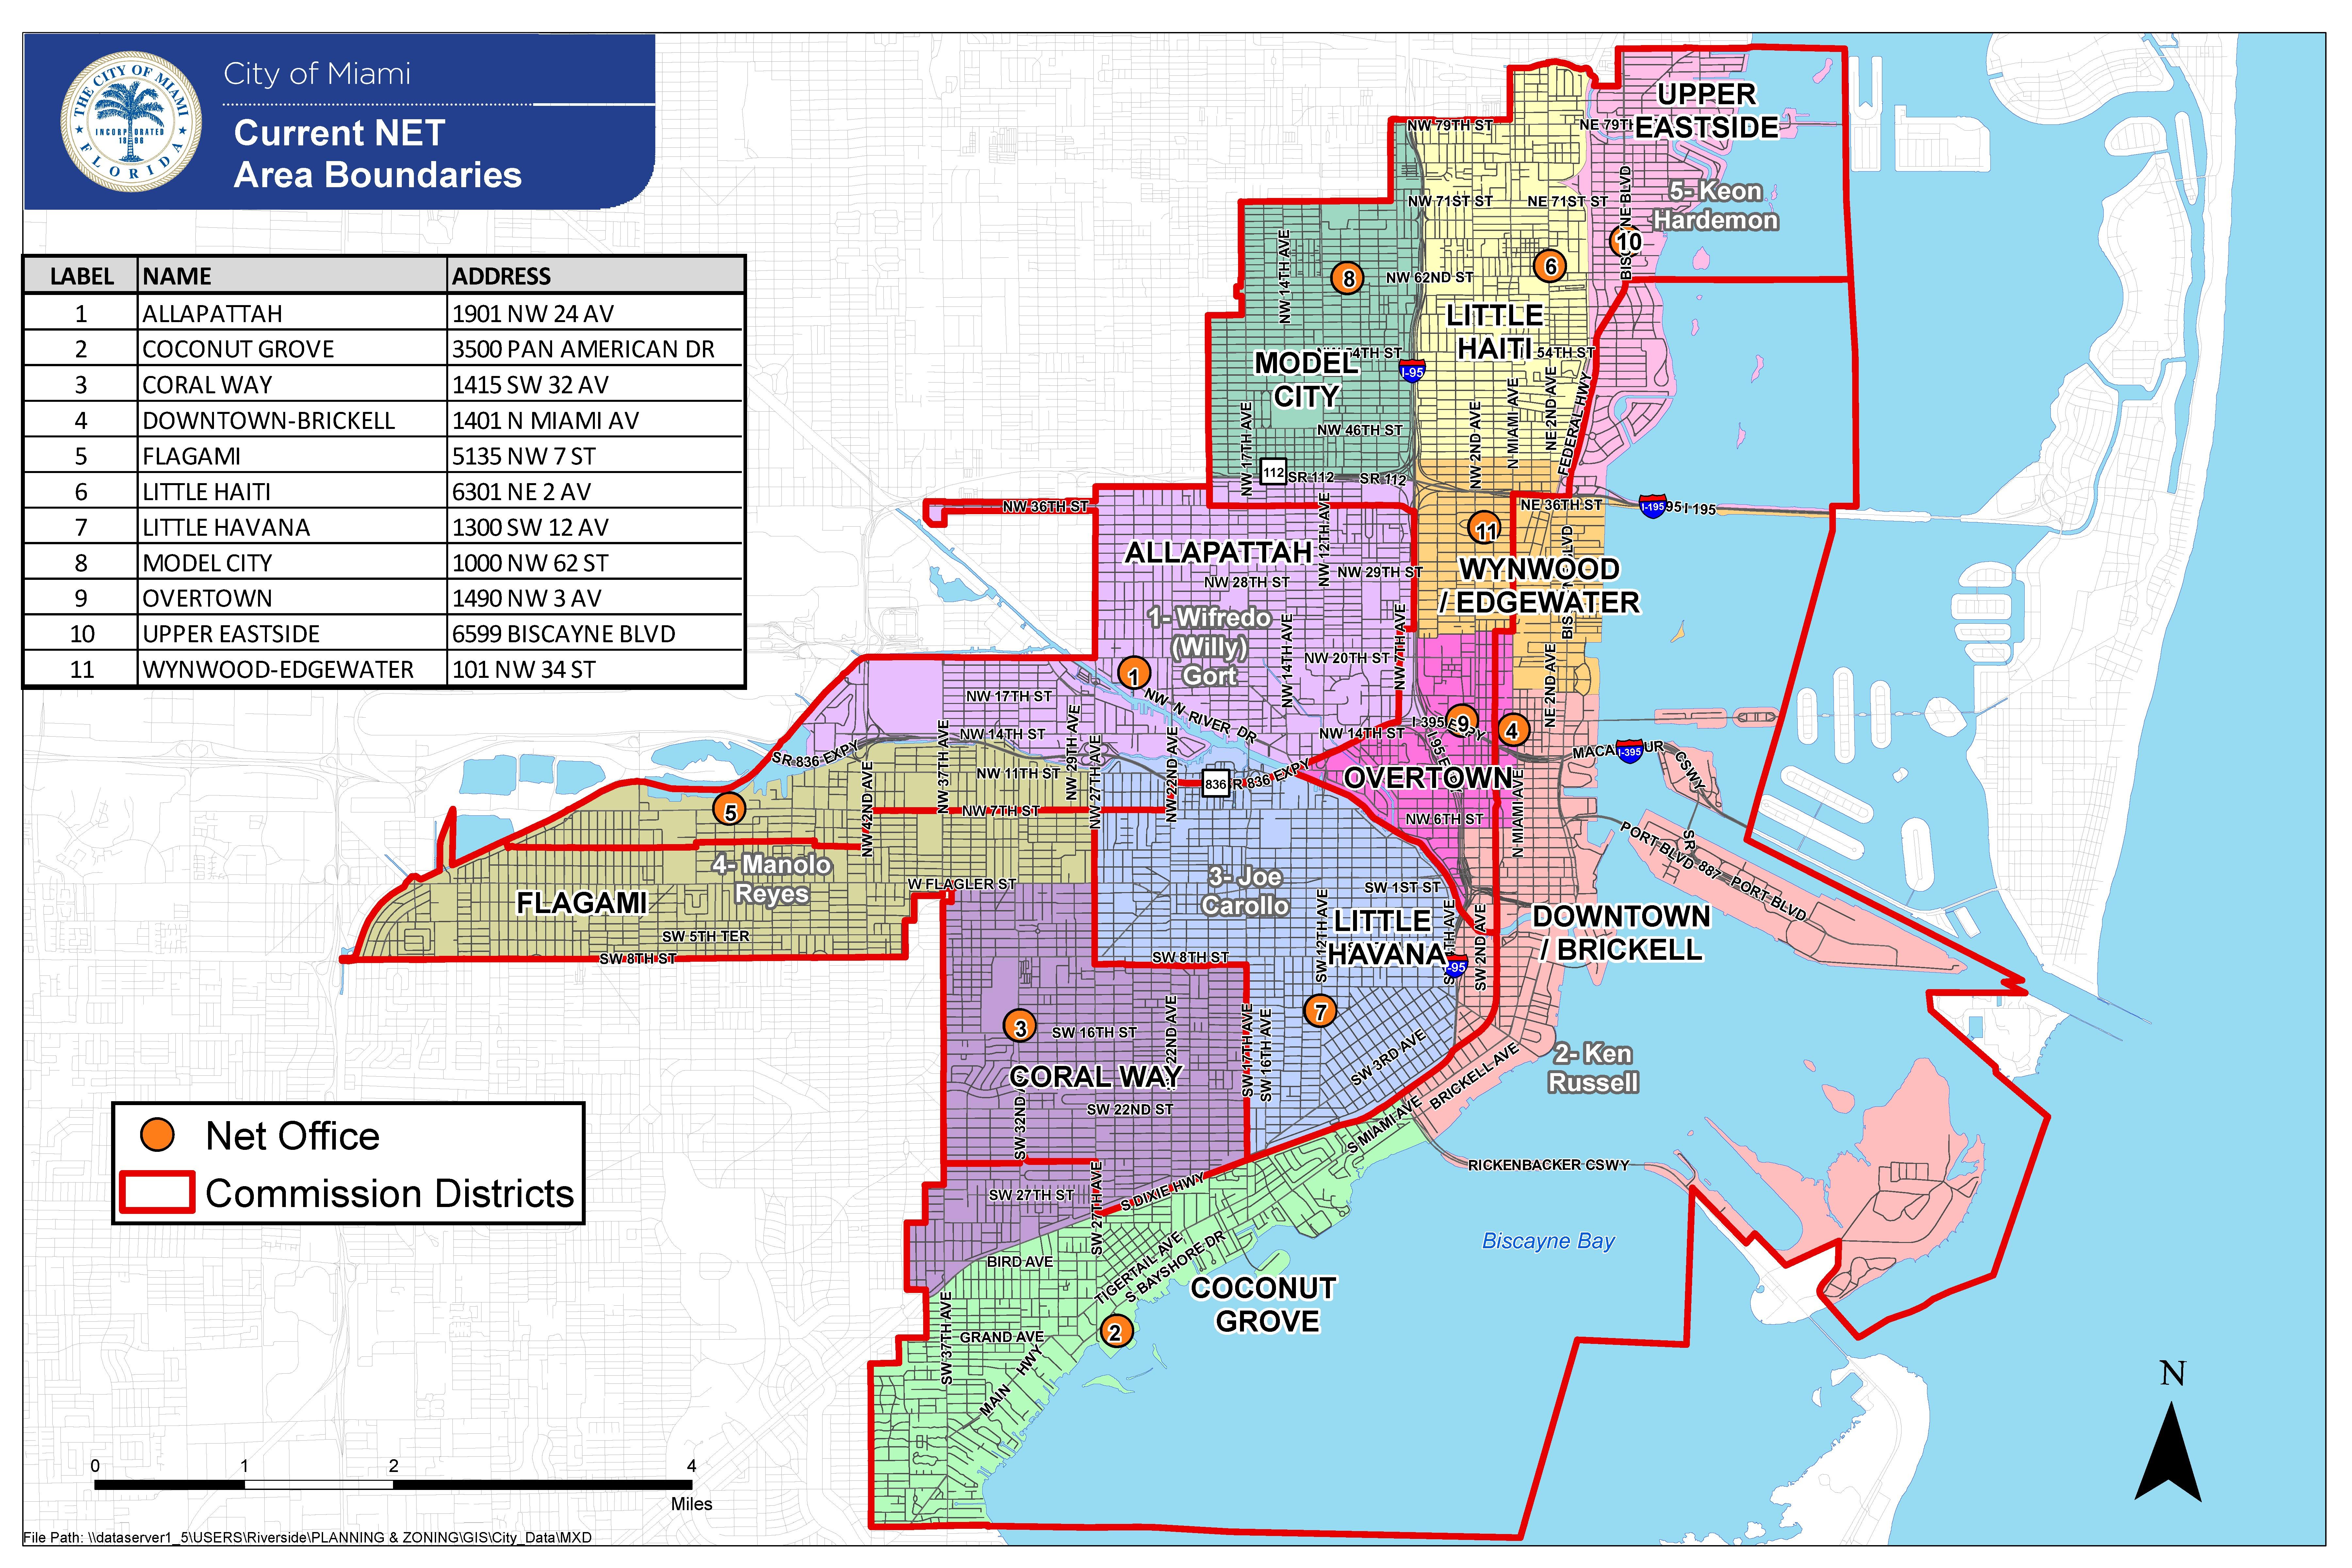 Net 20Current 20Boundaries 205 9 16 Map Of Miami Florida And - Map Of Miami Florida And Surrounding Areas